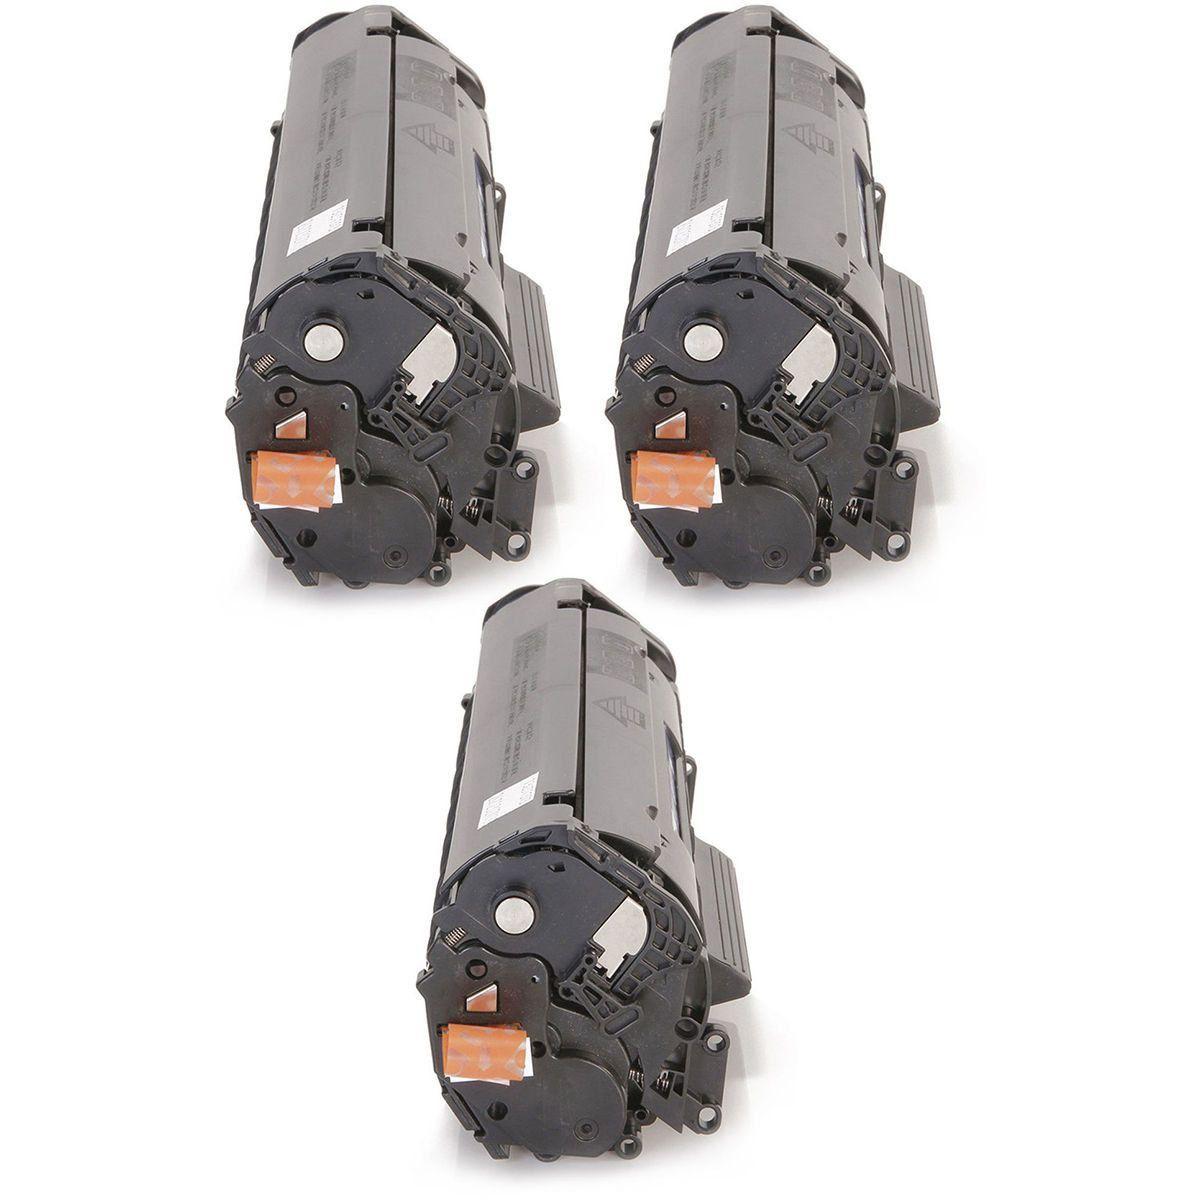 Compatível: Kit 3x Toner 2612 12A para HP 1012 1020 1022 1022n 1022nw 3015 3020 3050n 3052 3055 M1005 / Preto / 2.000